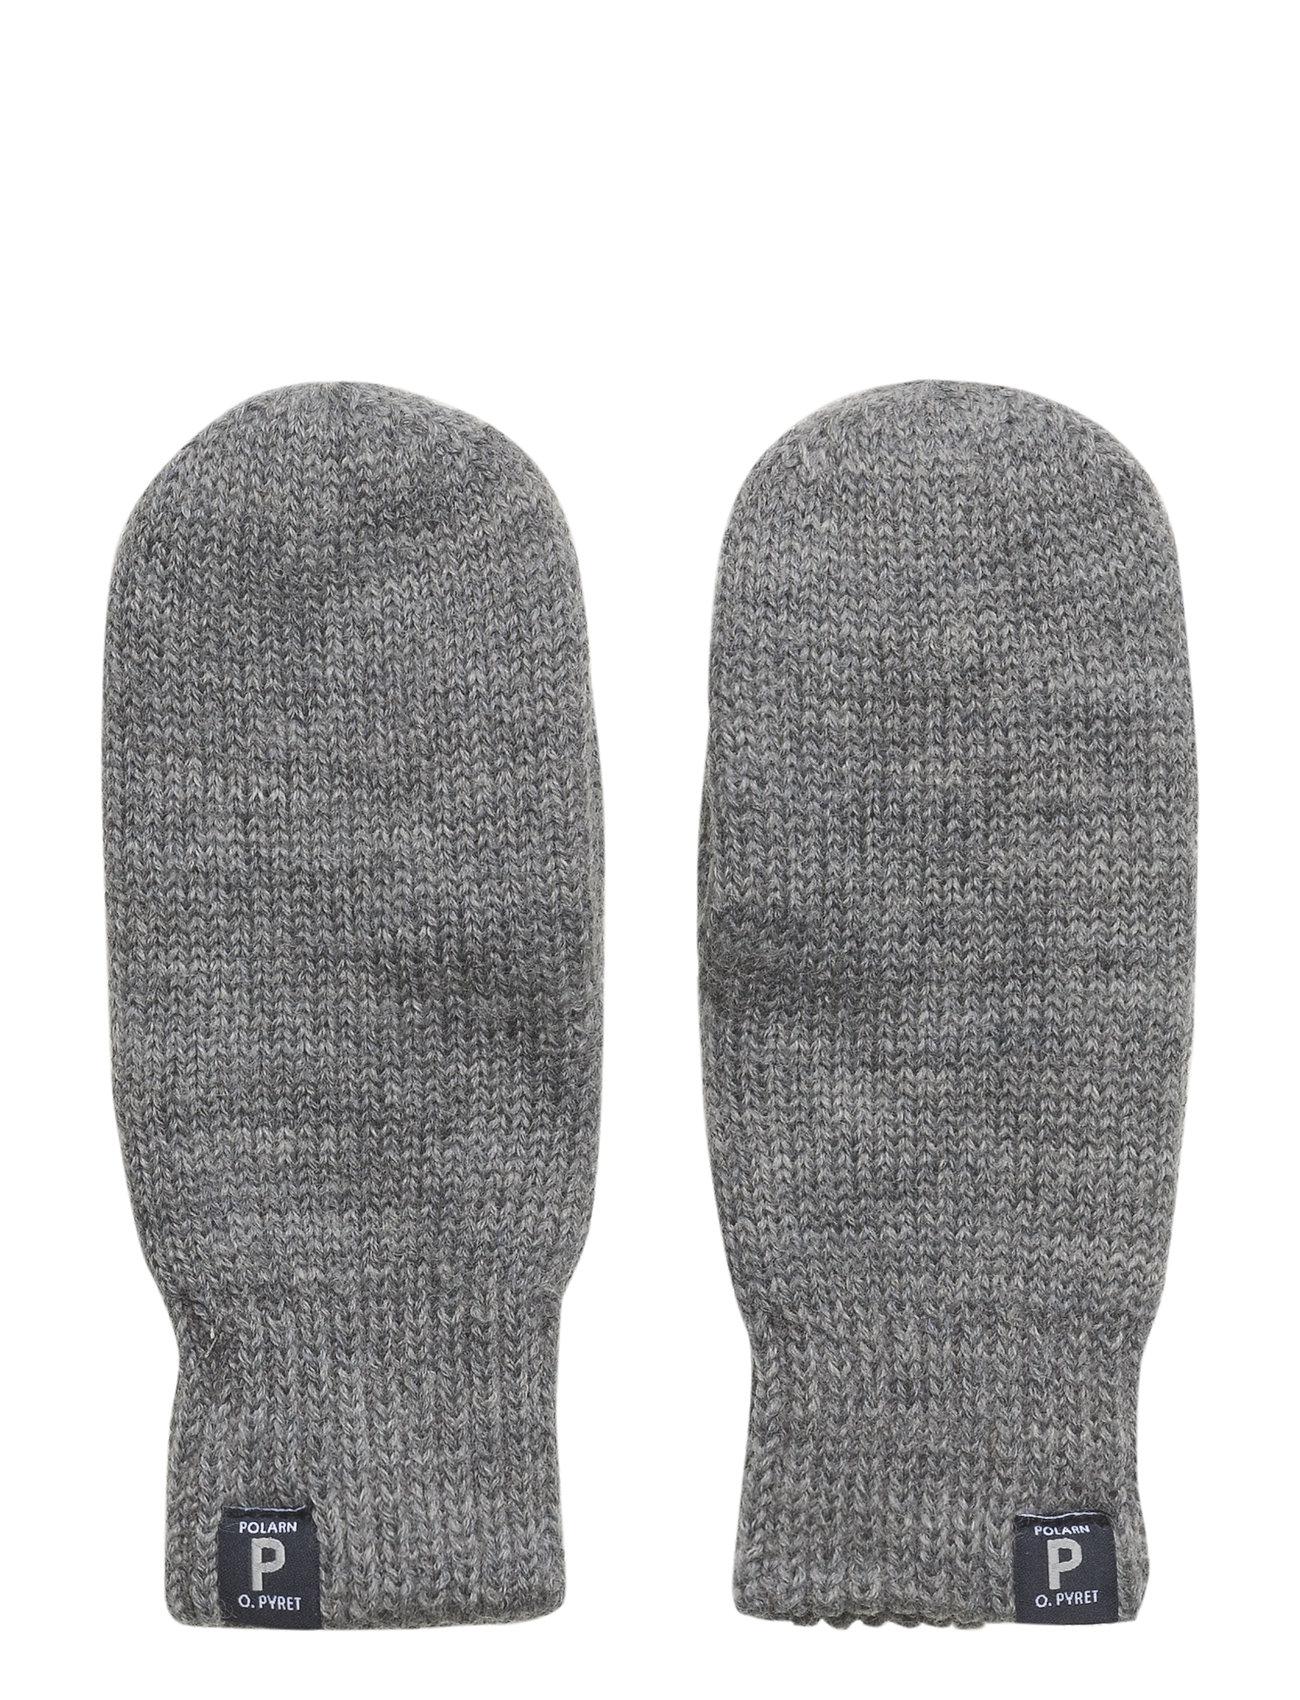 Polarn O. Pyret Mitten Wool Preschool - GREYMELANGE